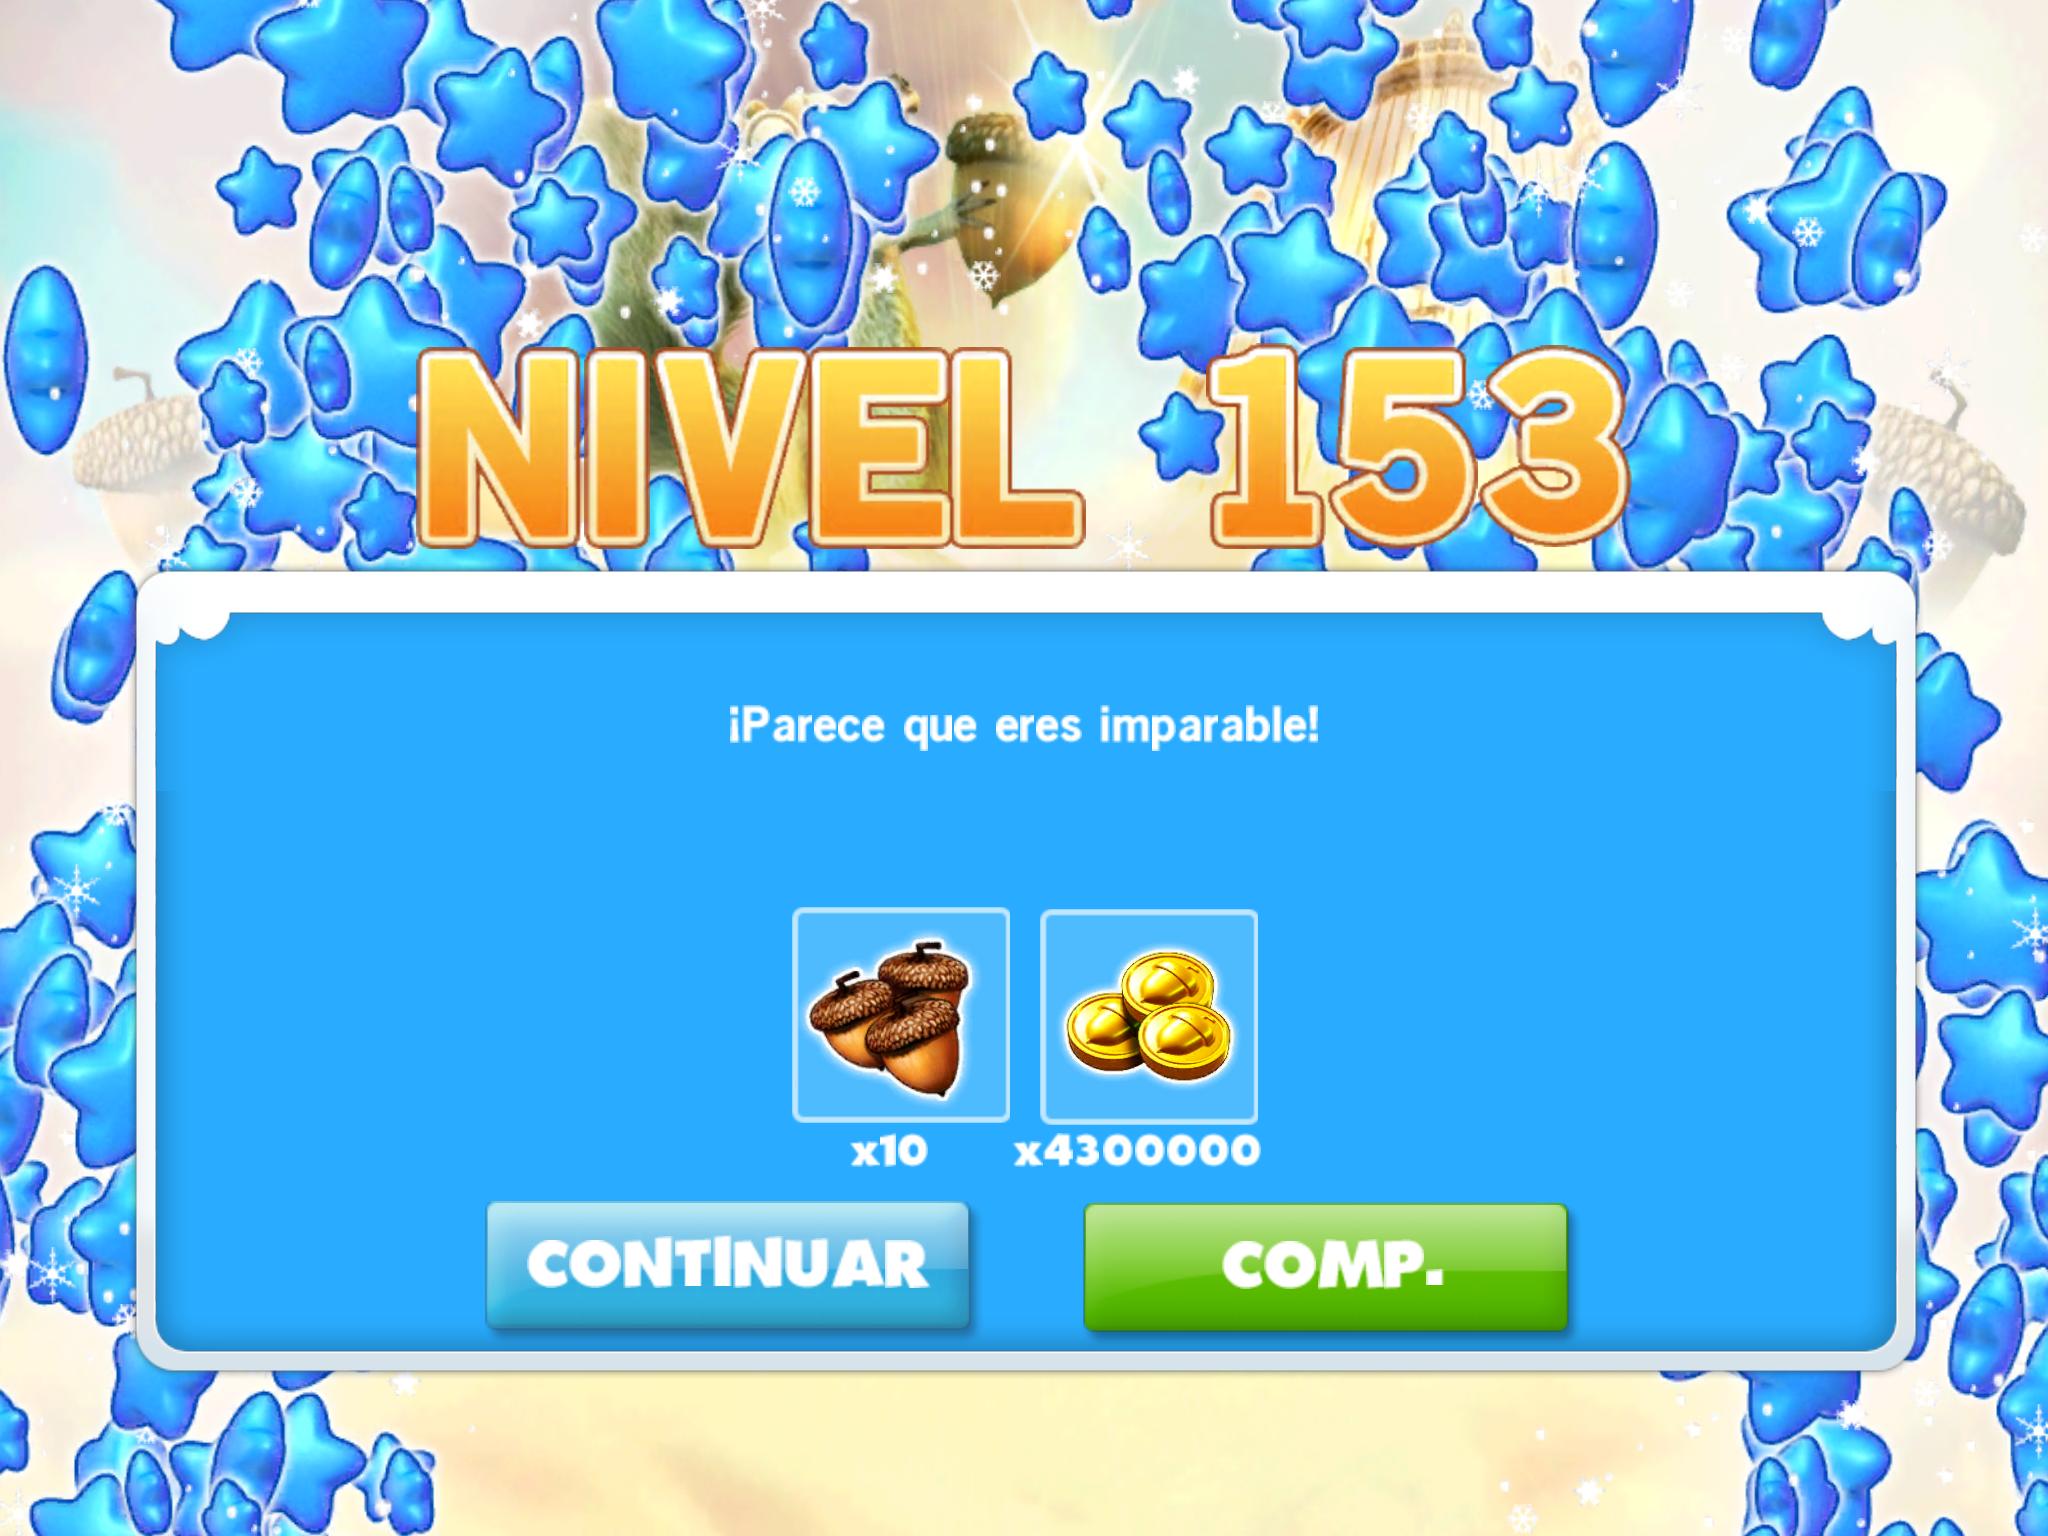 ice age village nivel 153  age hielo leyendas